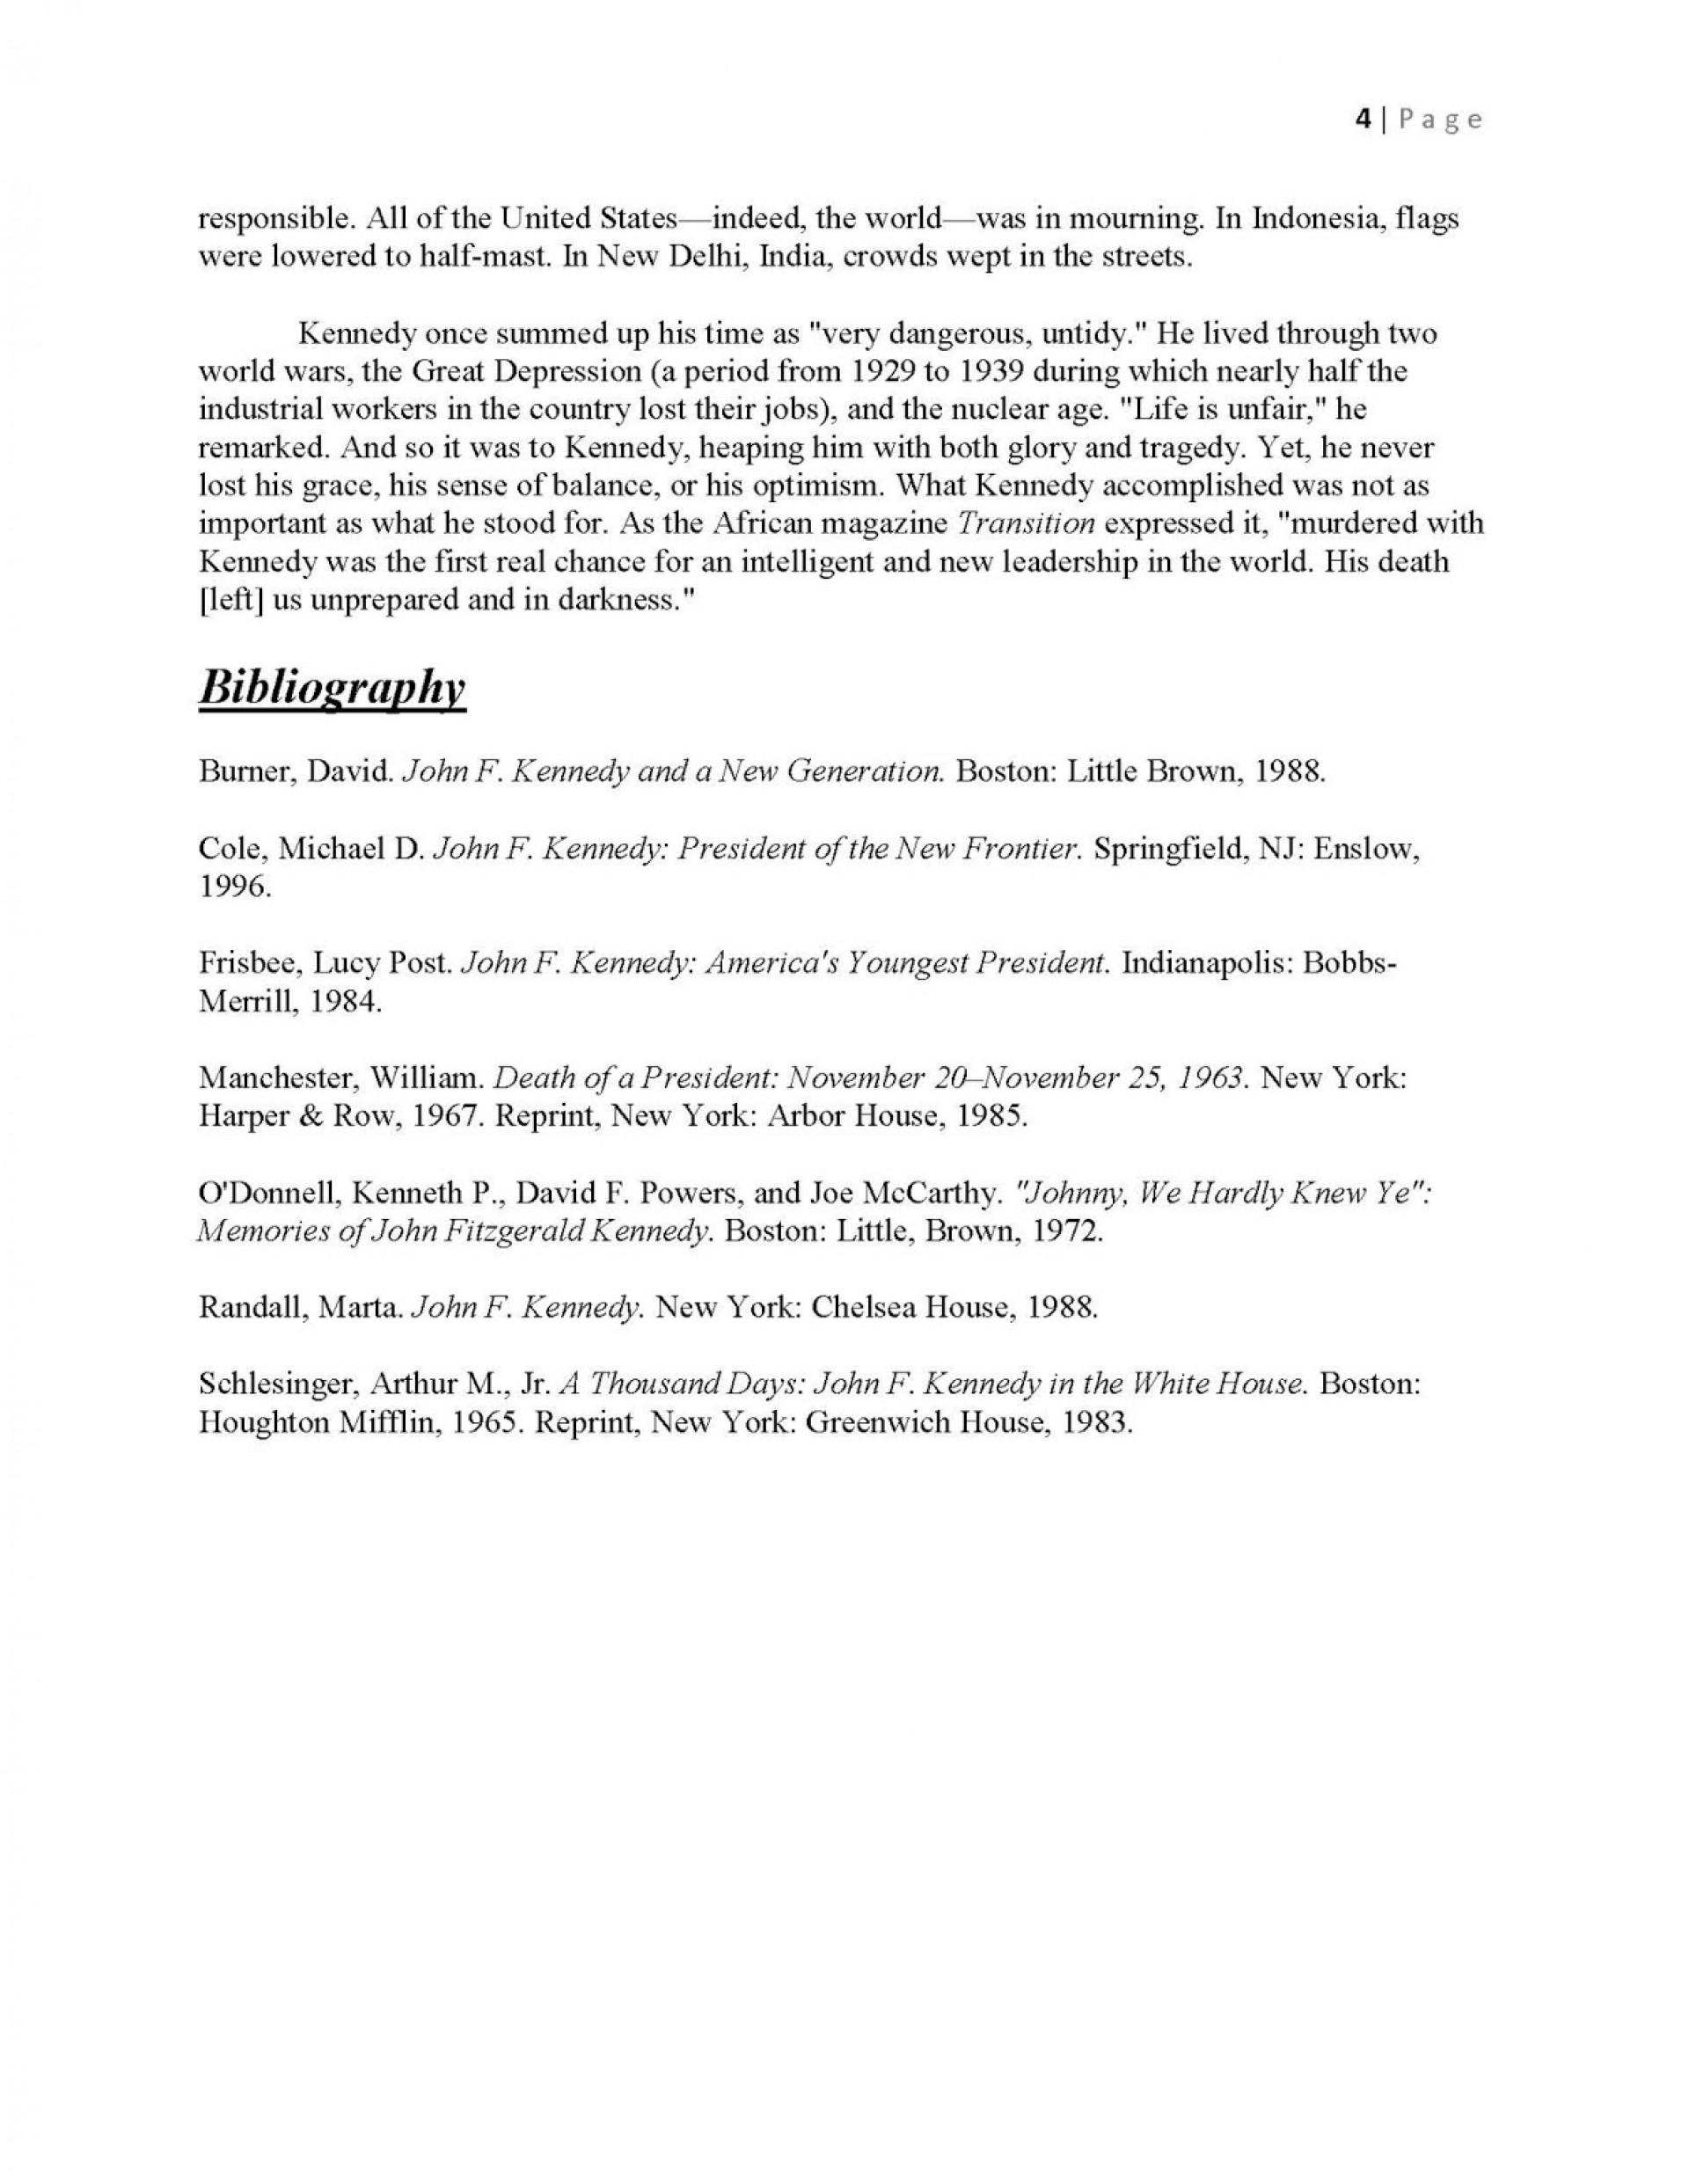 018 Jfkmlashortformbiographyreportexample Page 4 Diversity Essay Sample Fascinating Law School 1920